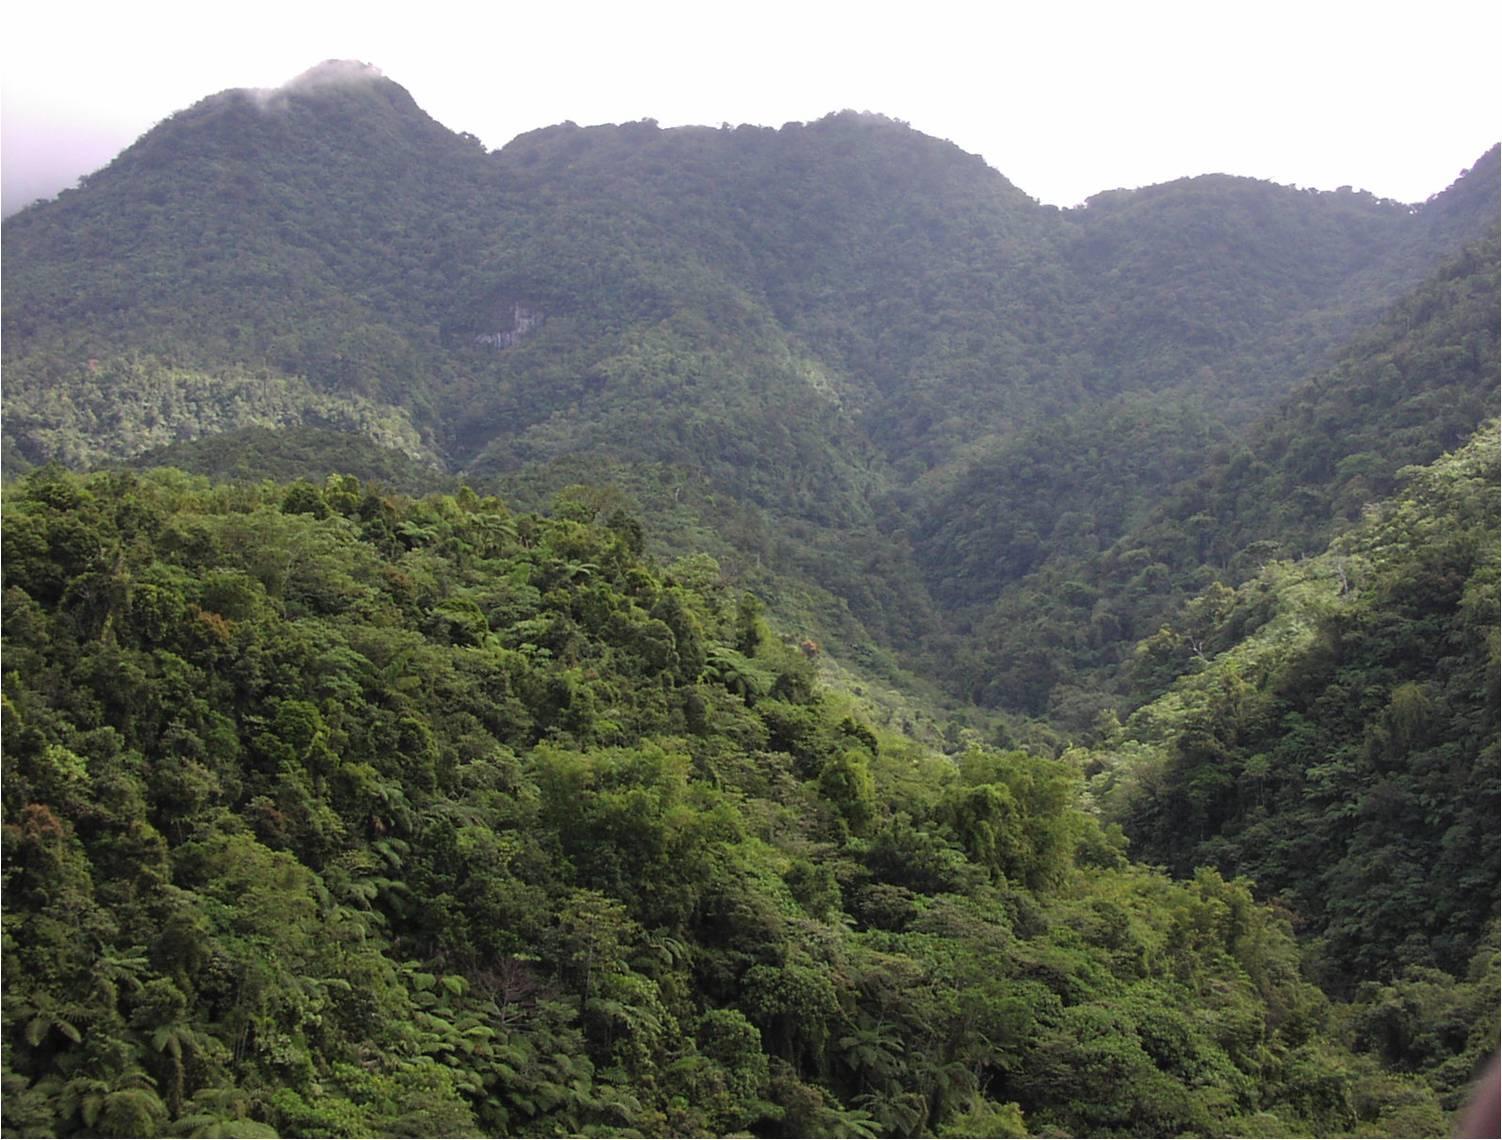 Northern Negros Natural Park